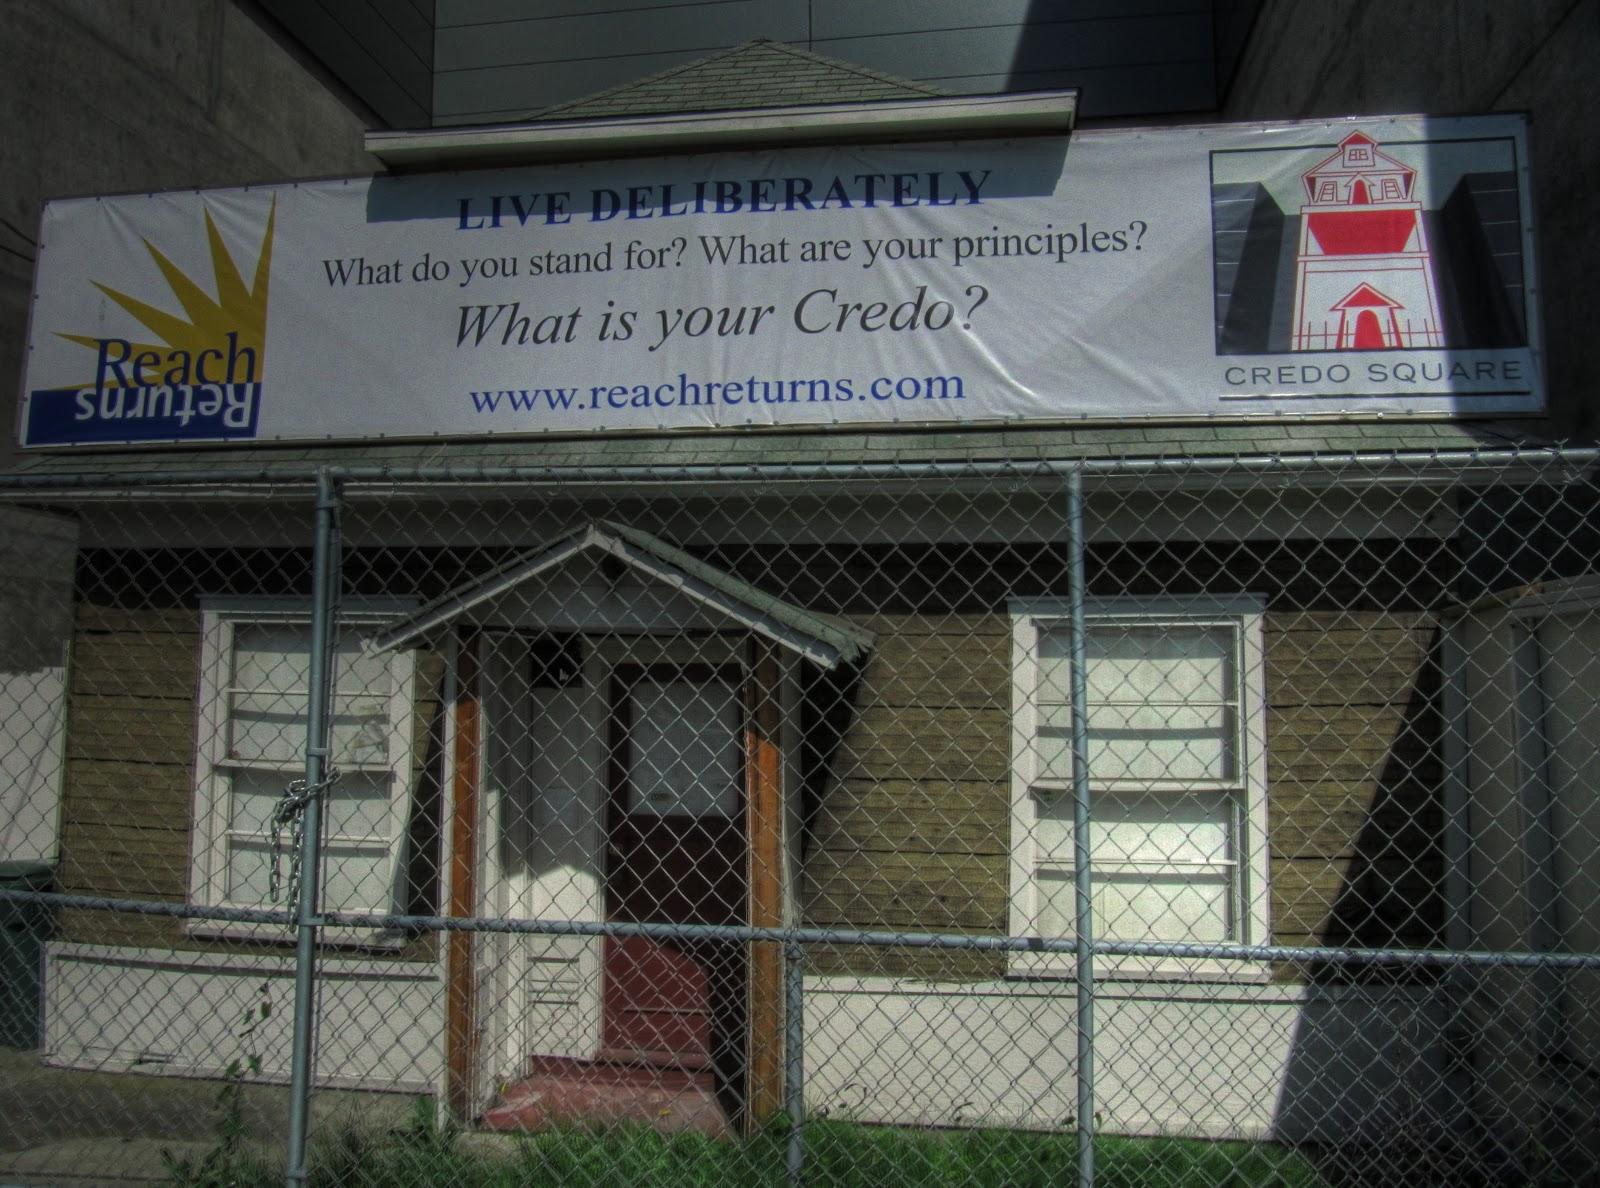 This life in ruins ballard blocks edith macefield 39 s house for Ballard house